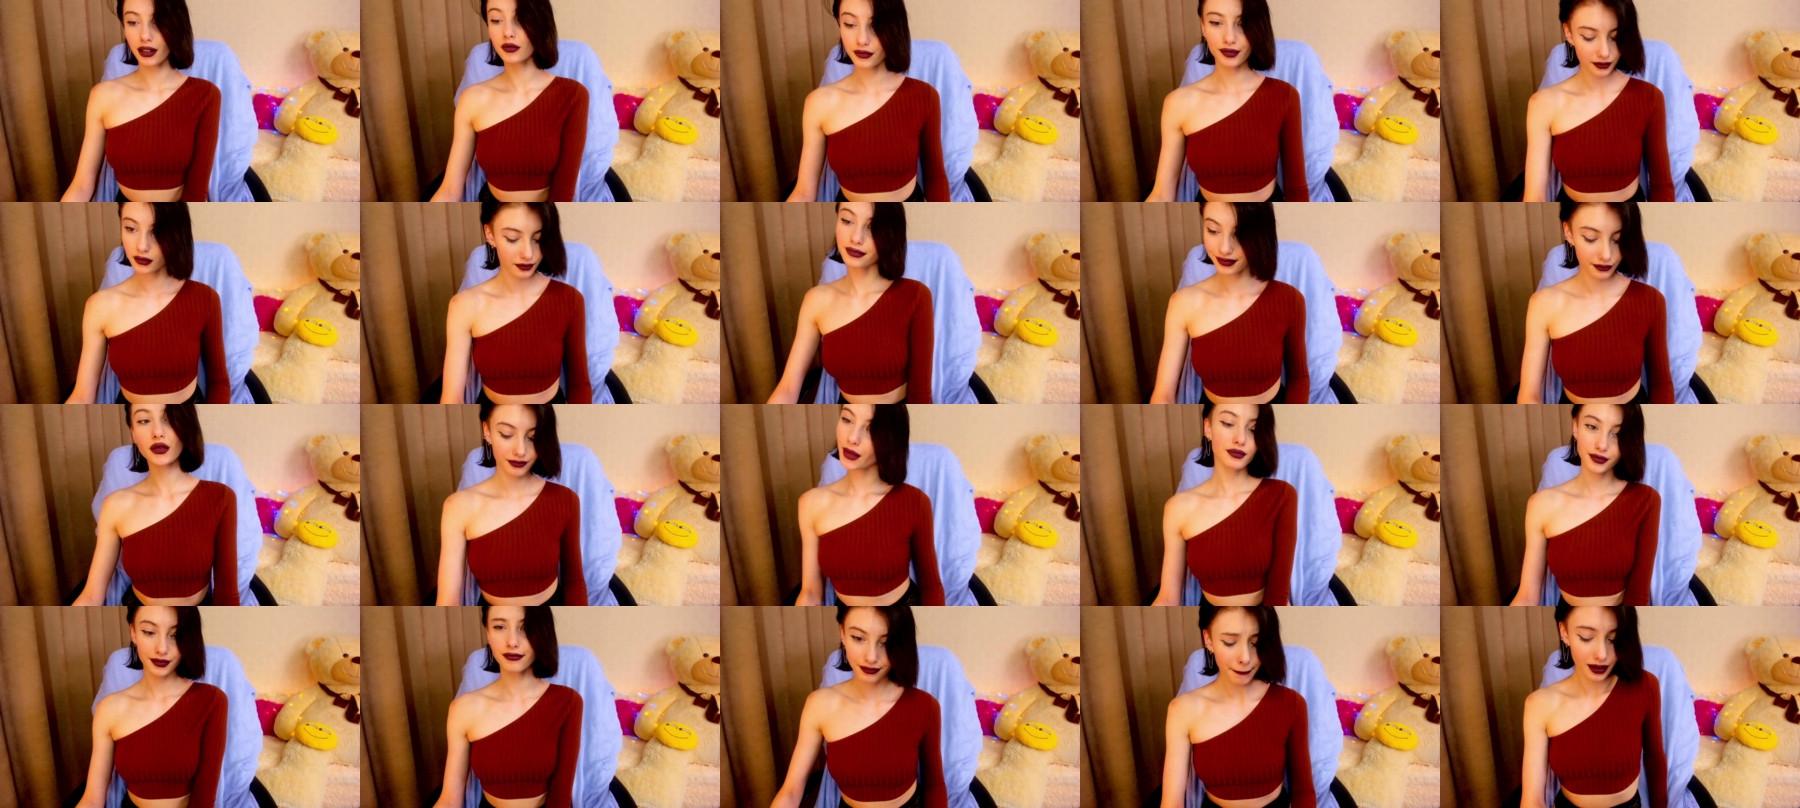 Sweety_Sonya ts 17-04-2021 Chaturbate trans Nude